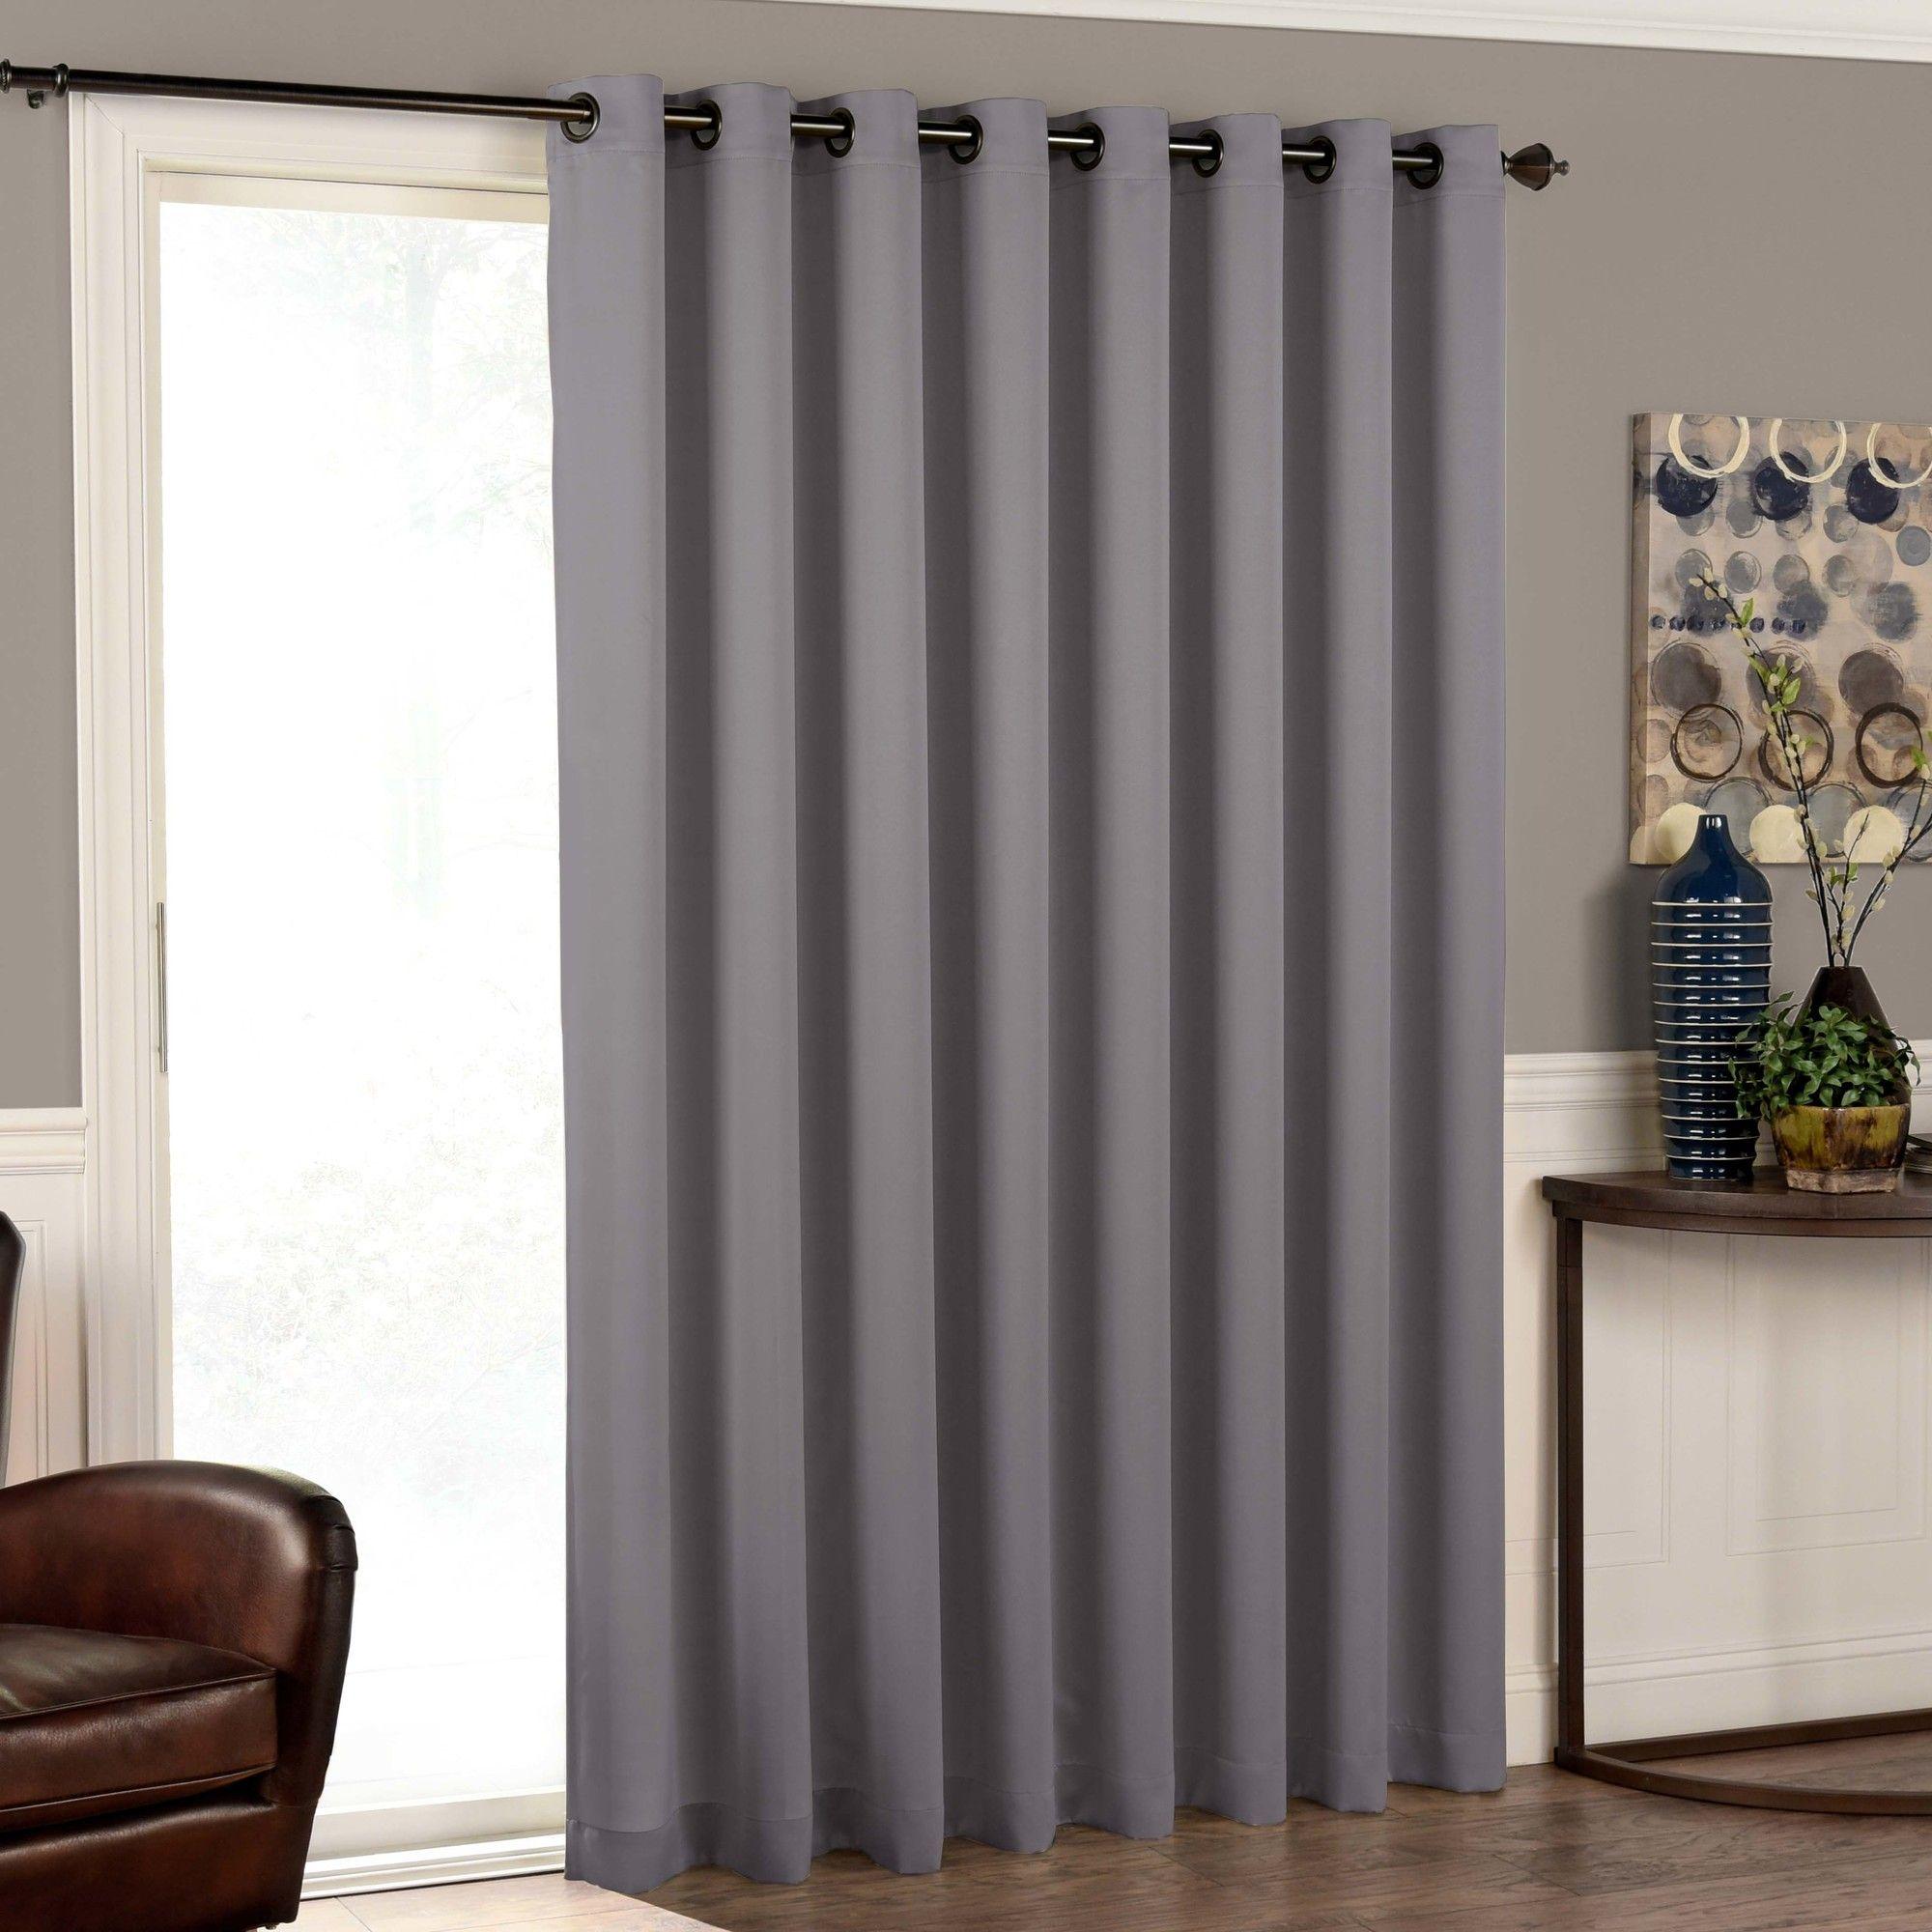 Cantor Solid Room Darkening Grommet Single Curtain Panel